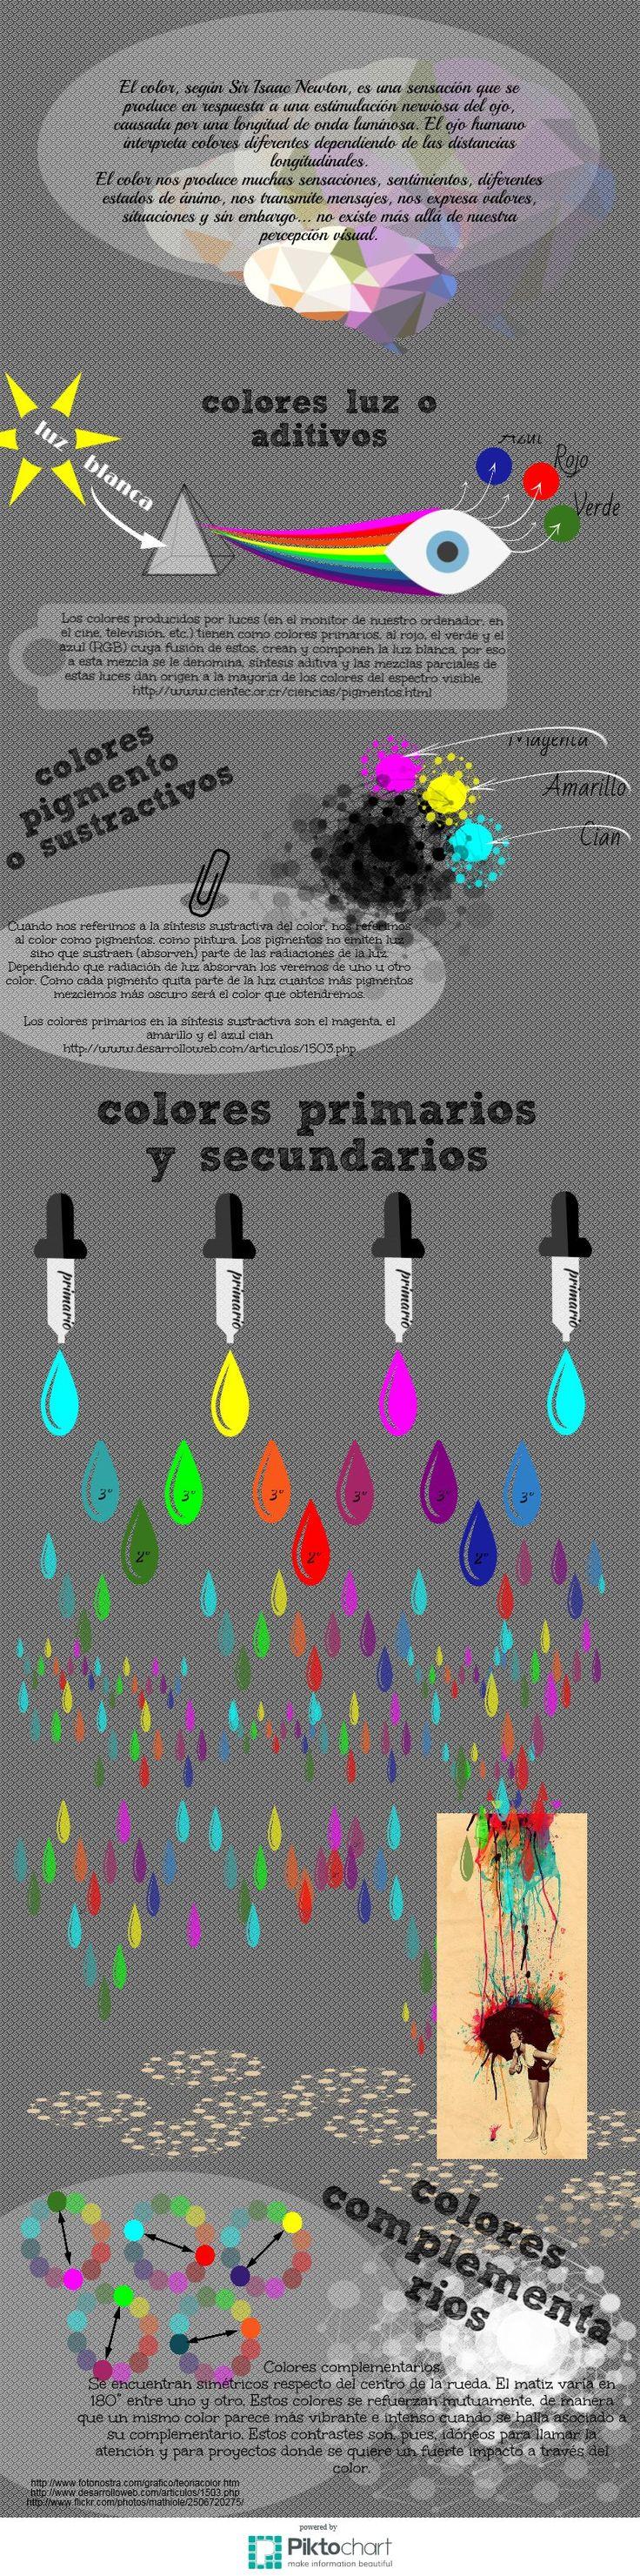 Infografia Cromatica I | Piktochart Infographic Editor